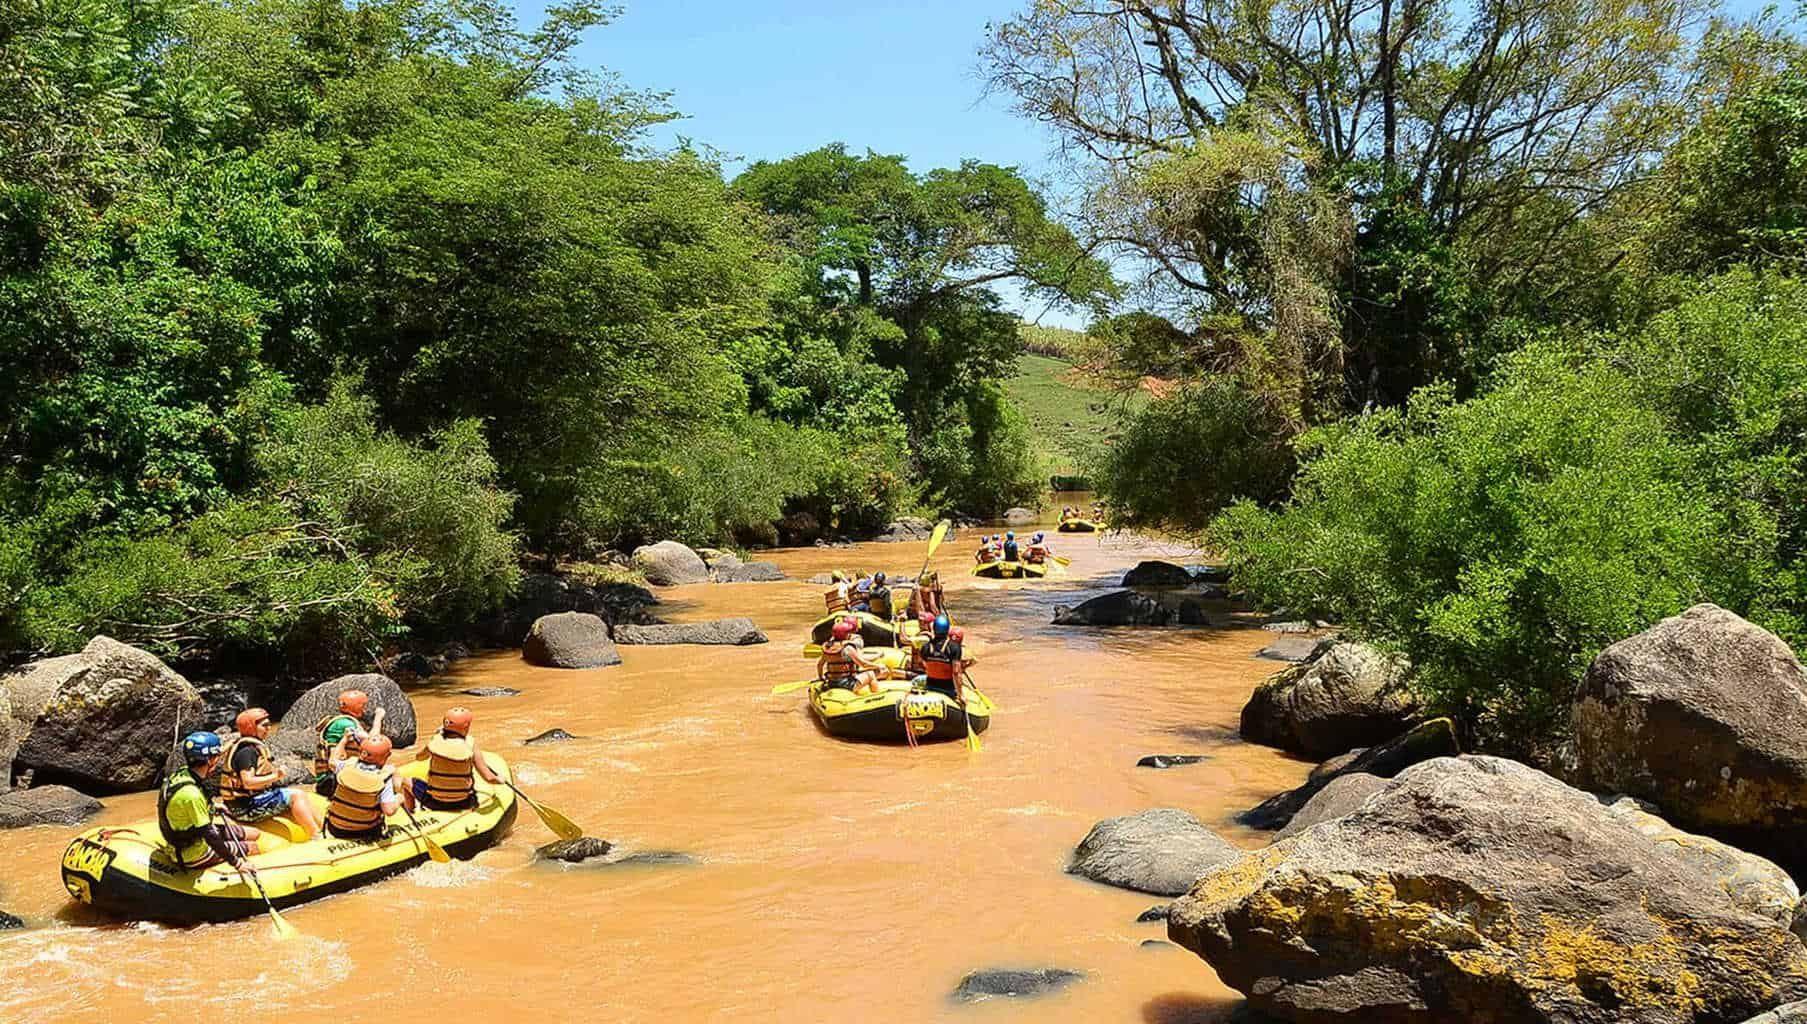 rafting-em-socorro-sp-circuito-das-aguas-paulista-6366280-8959617-1303778